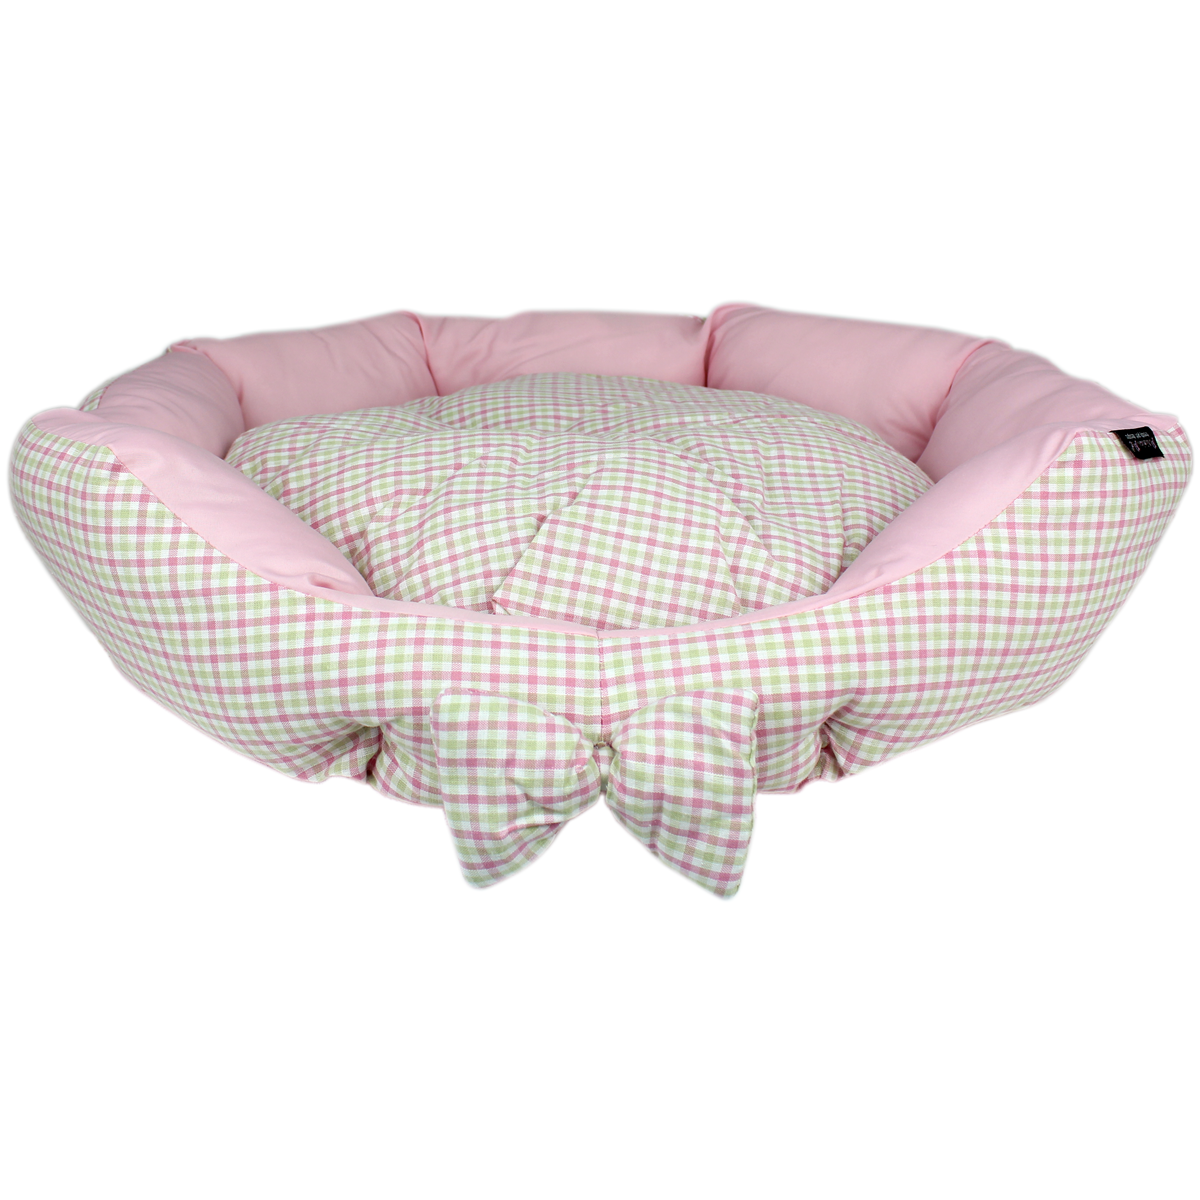 Parisian Pet Pinkberry Plaid Dog Bed